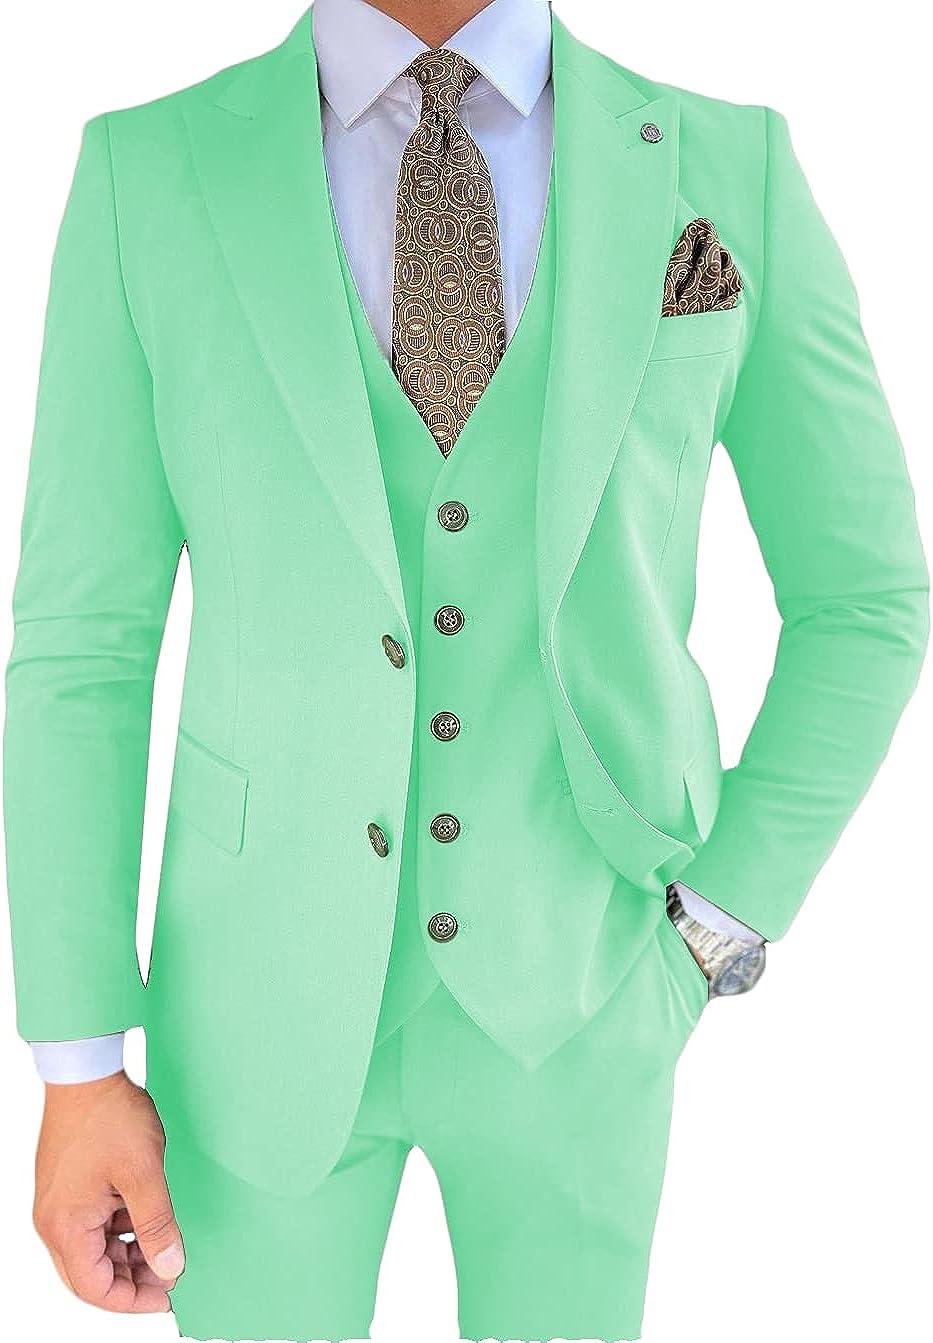 Surprise price Aesido Men's Suits Regular Fit 3 Tuxedos Pieces J Business Rare Solid